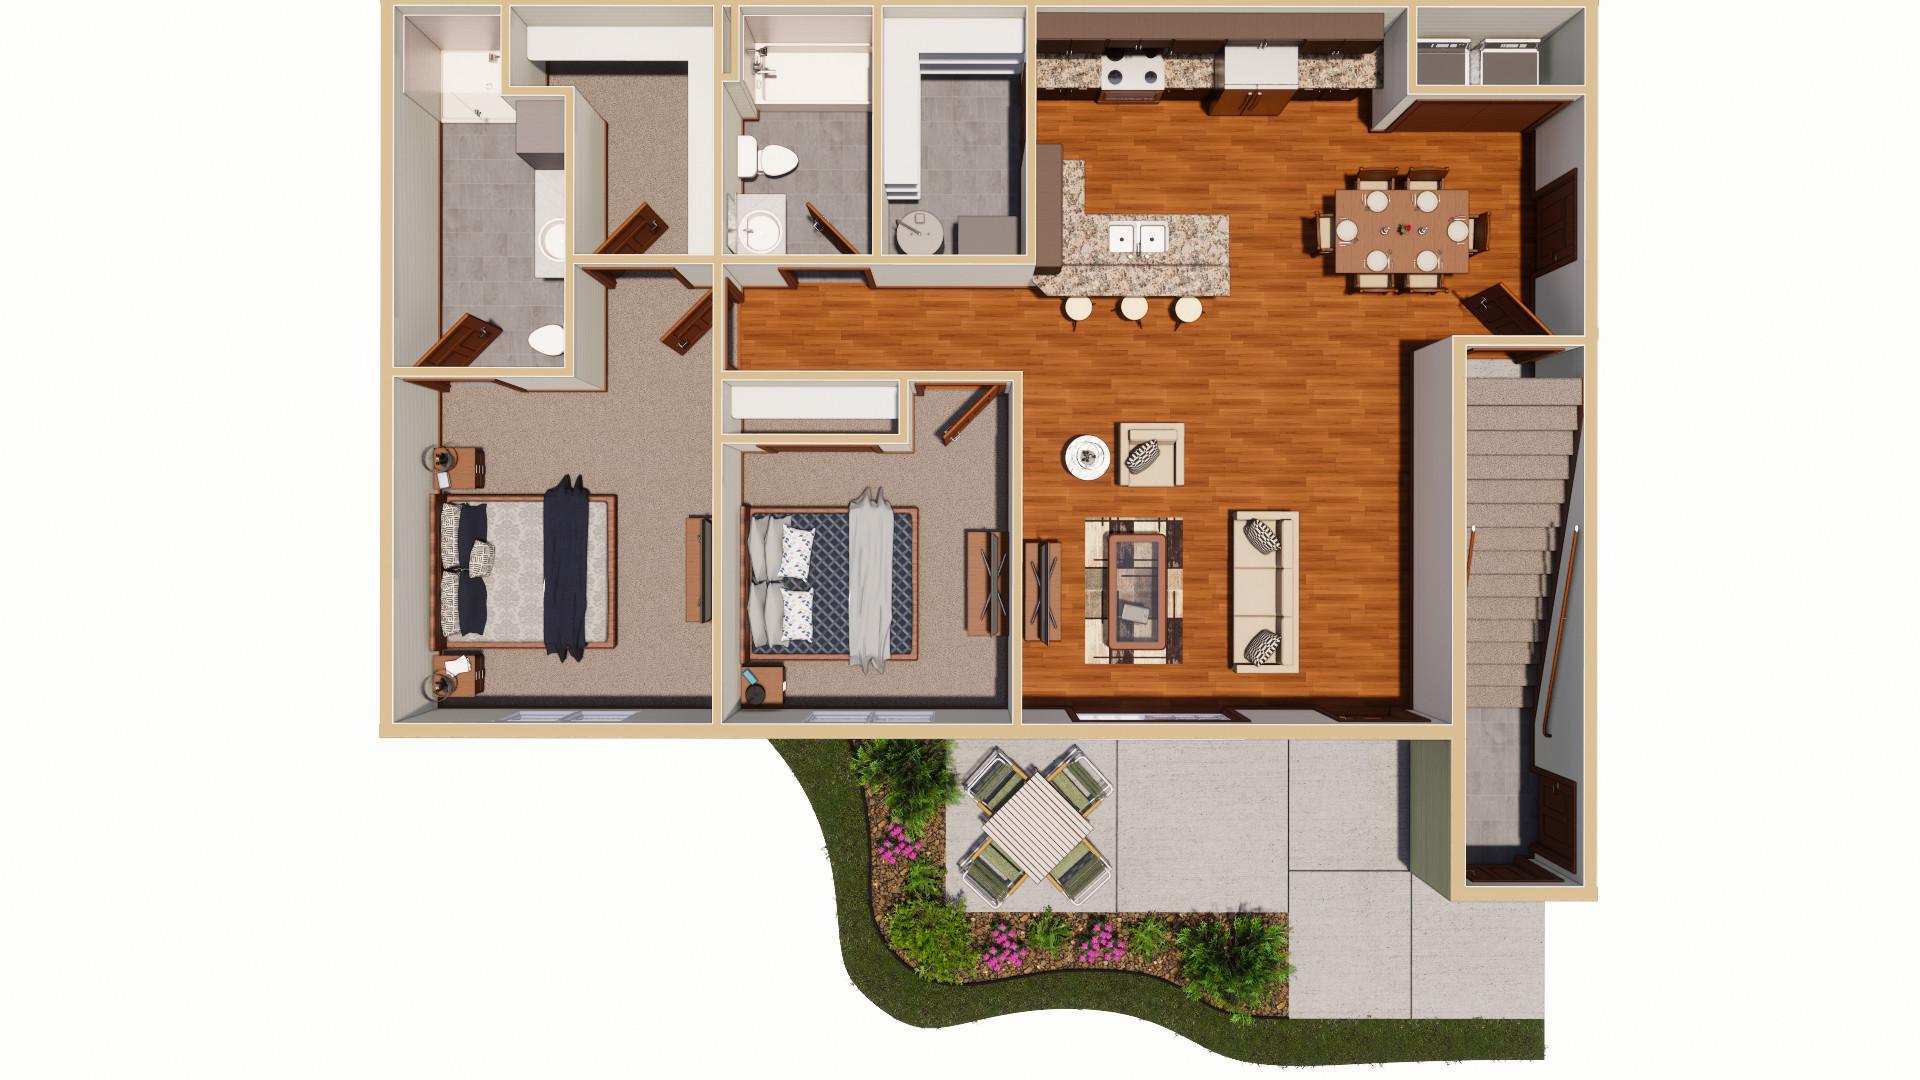 07-07-2020 Elk's Apartments 1st Floor Rendering